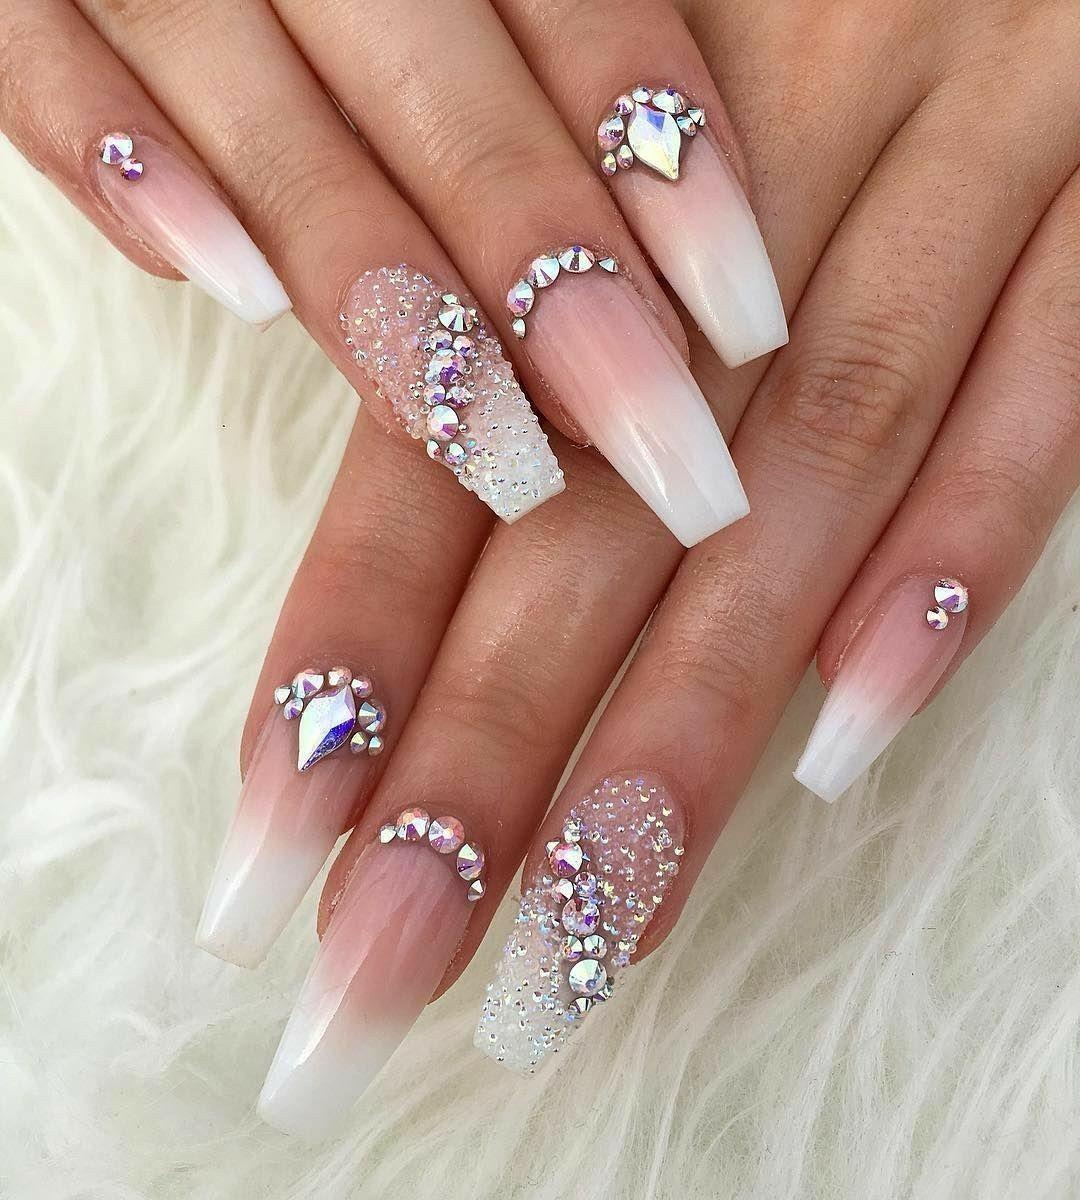 @elcashdoll | Glamour nails, Aycrlic nails, Pretty nail art